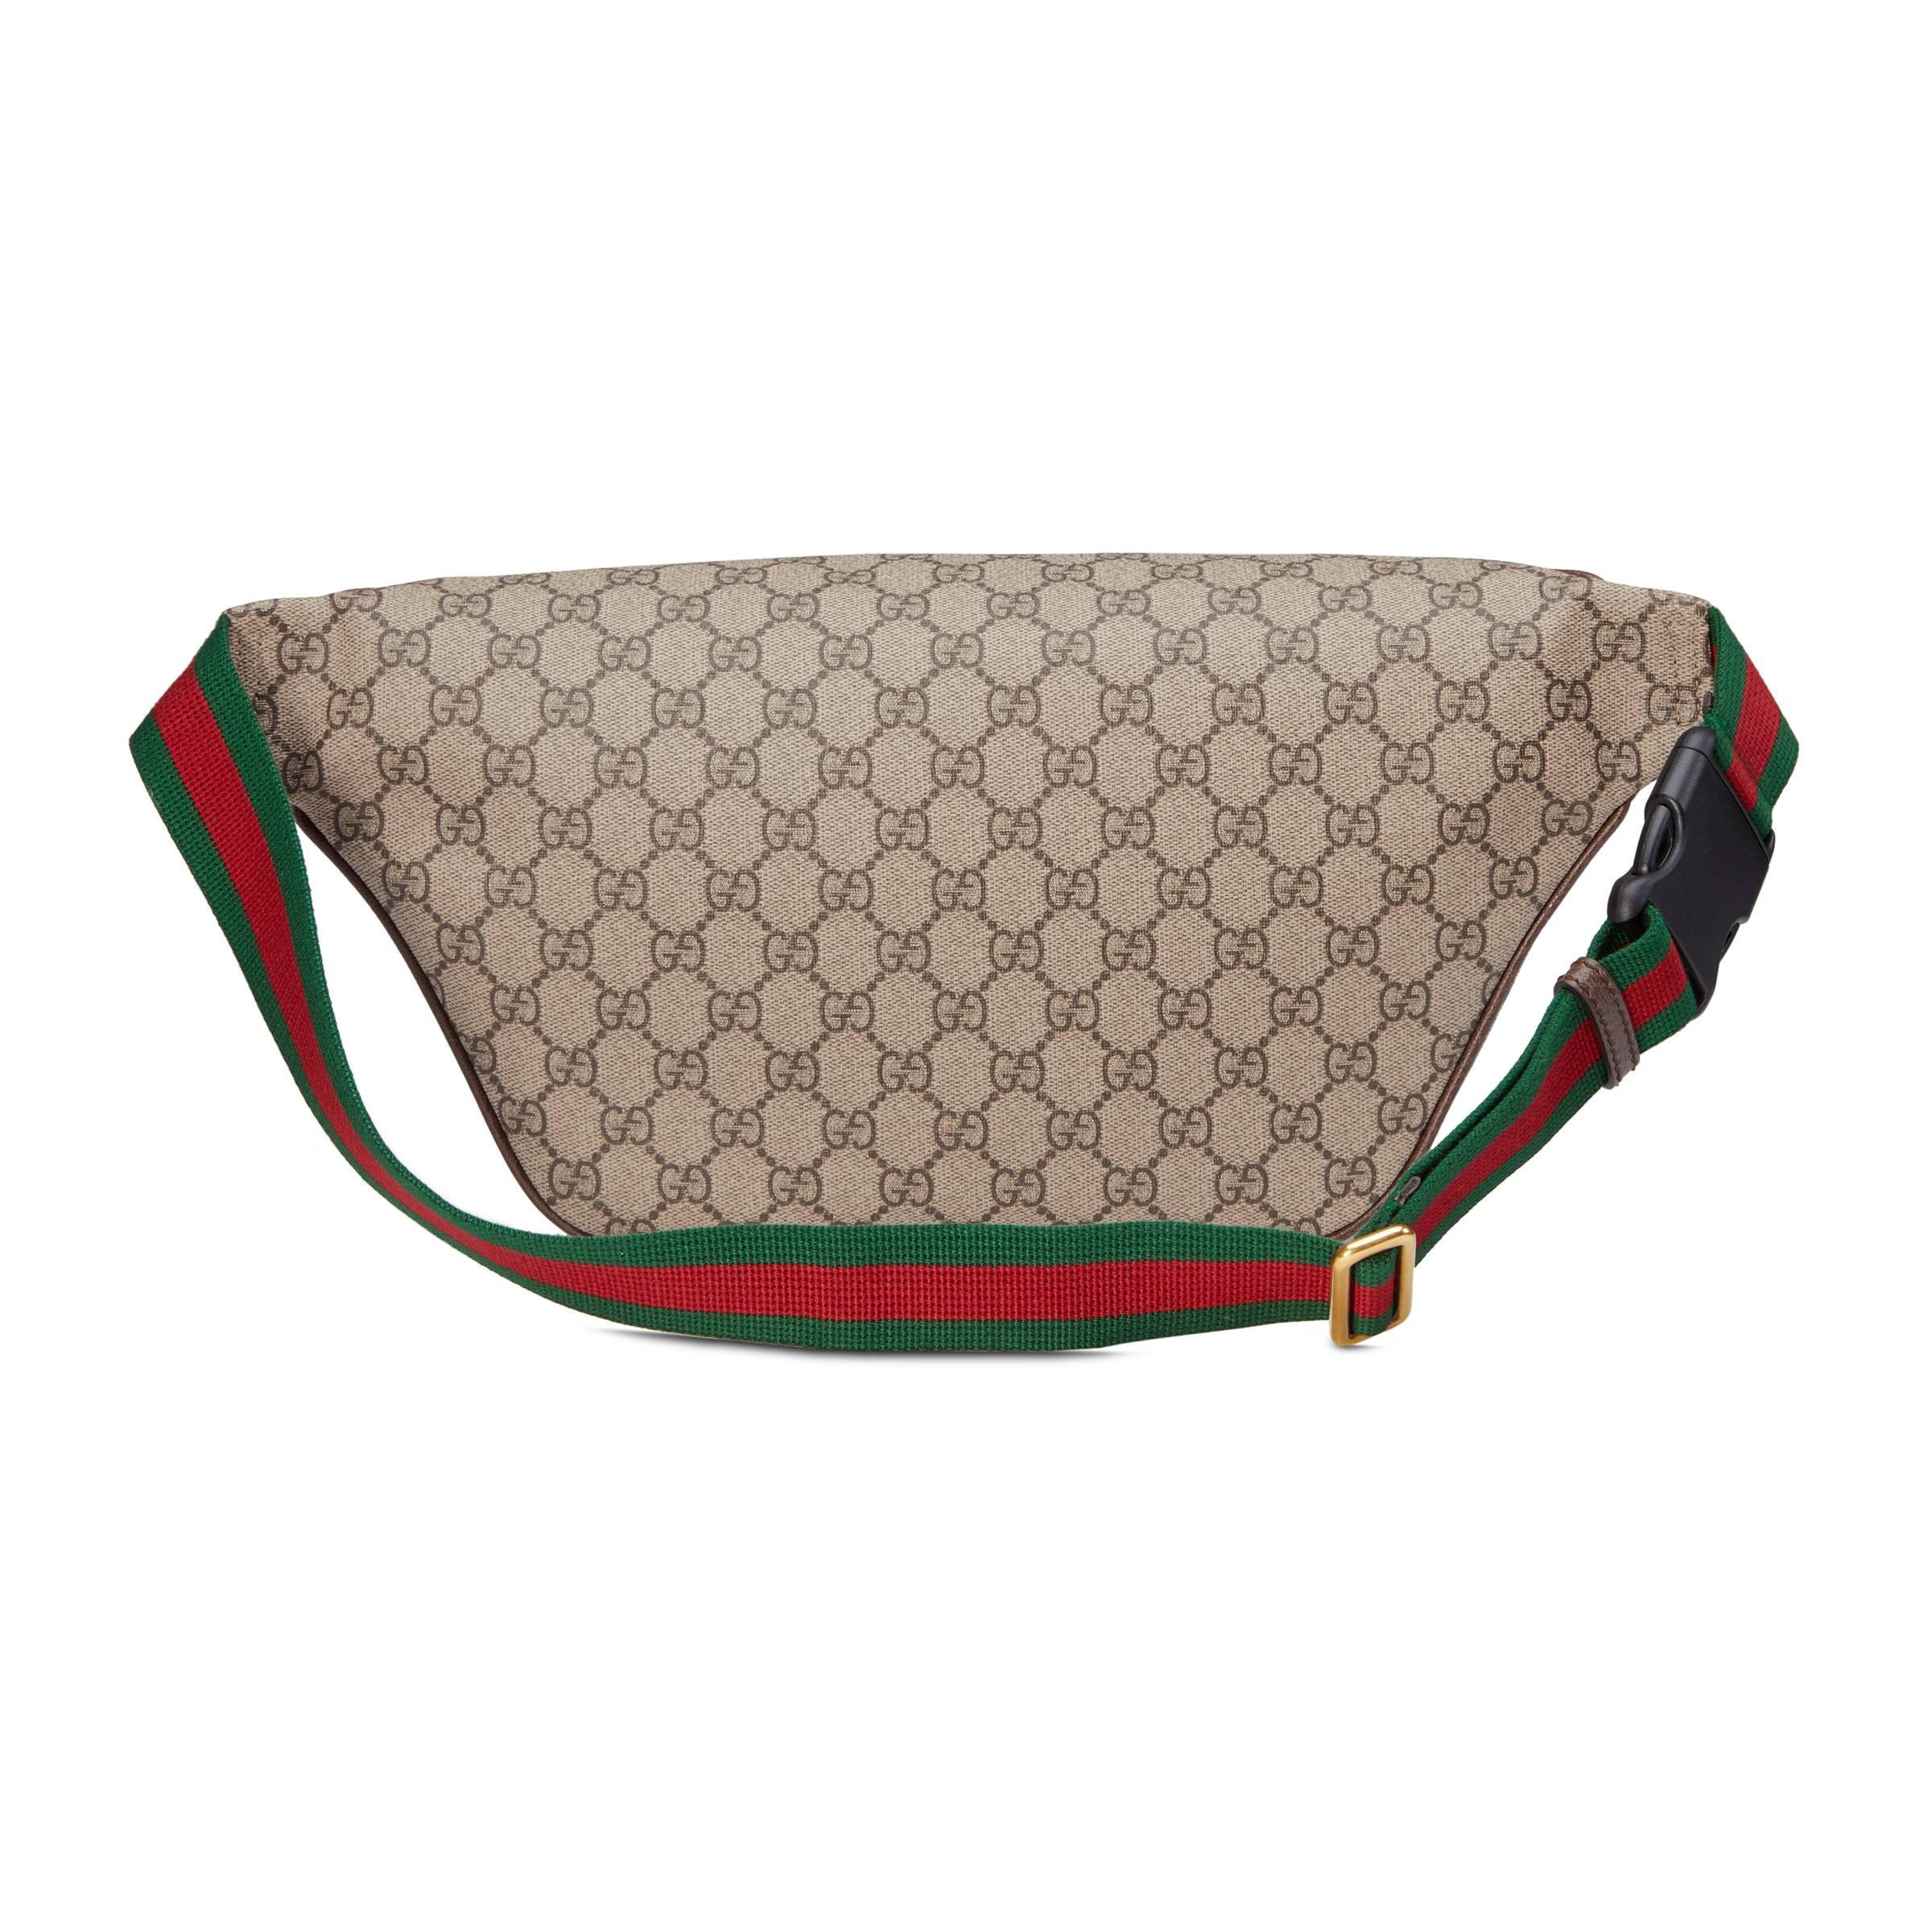 729fc16bd1ca15 Gucci - Natural Courrier GG Supreme Belt Bag for Men - Lyst. View fullscreen